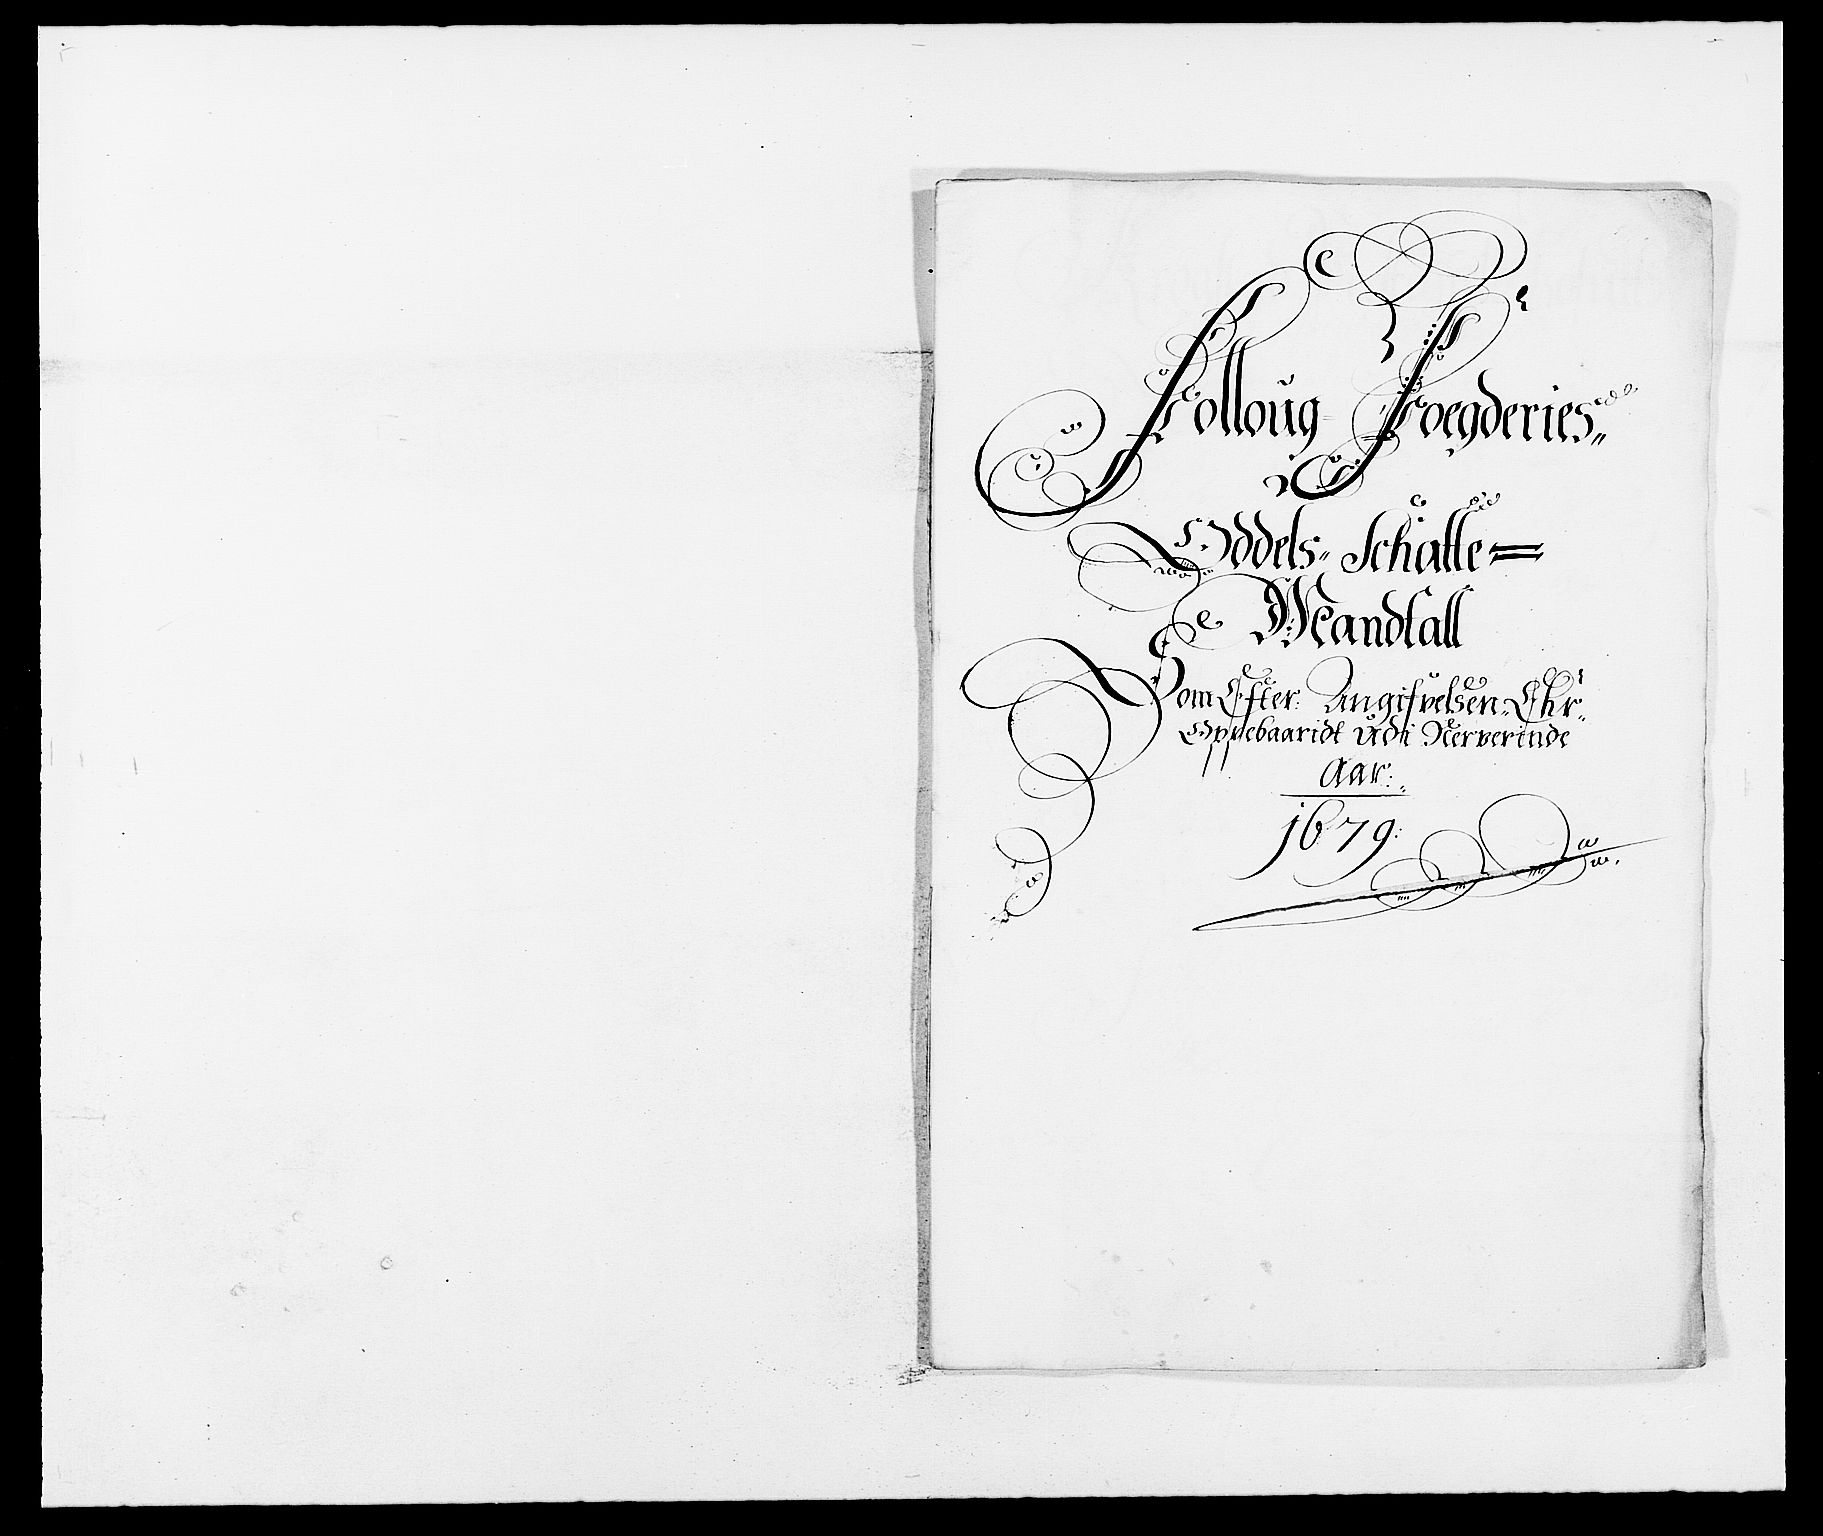 RA, Rentekammeret inntil 1814, Reviderte regnskaper, Fogderegnskap, R09/L0428: Fogderegnskap Follo, 1679, s. 138